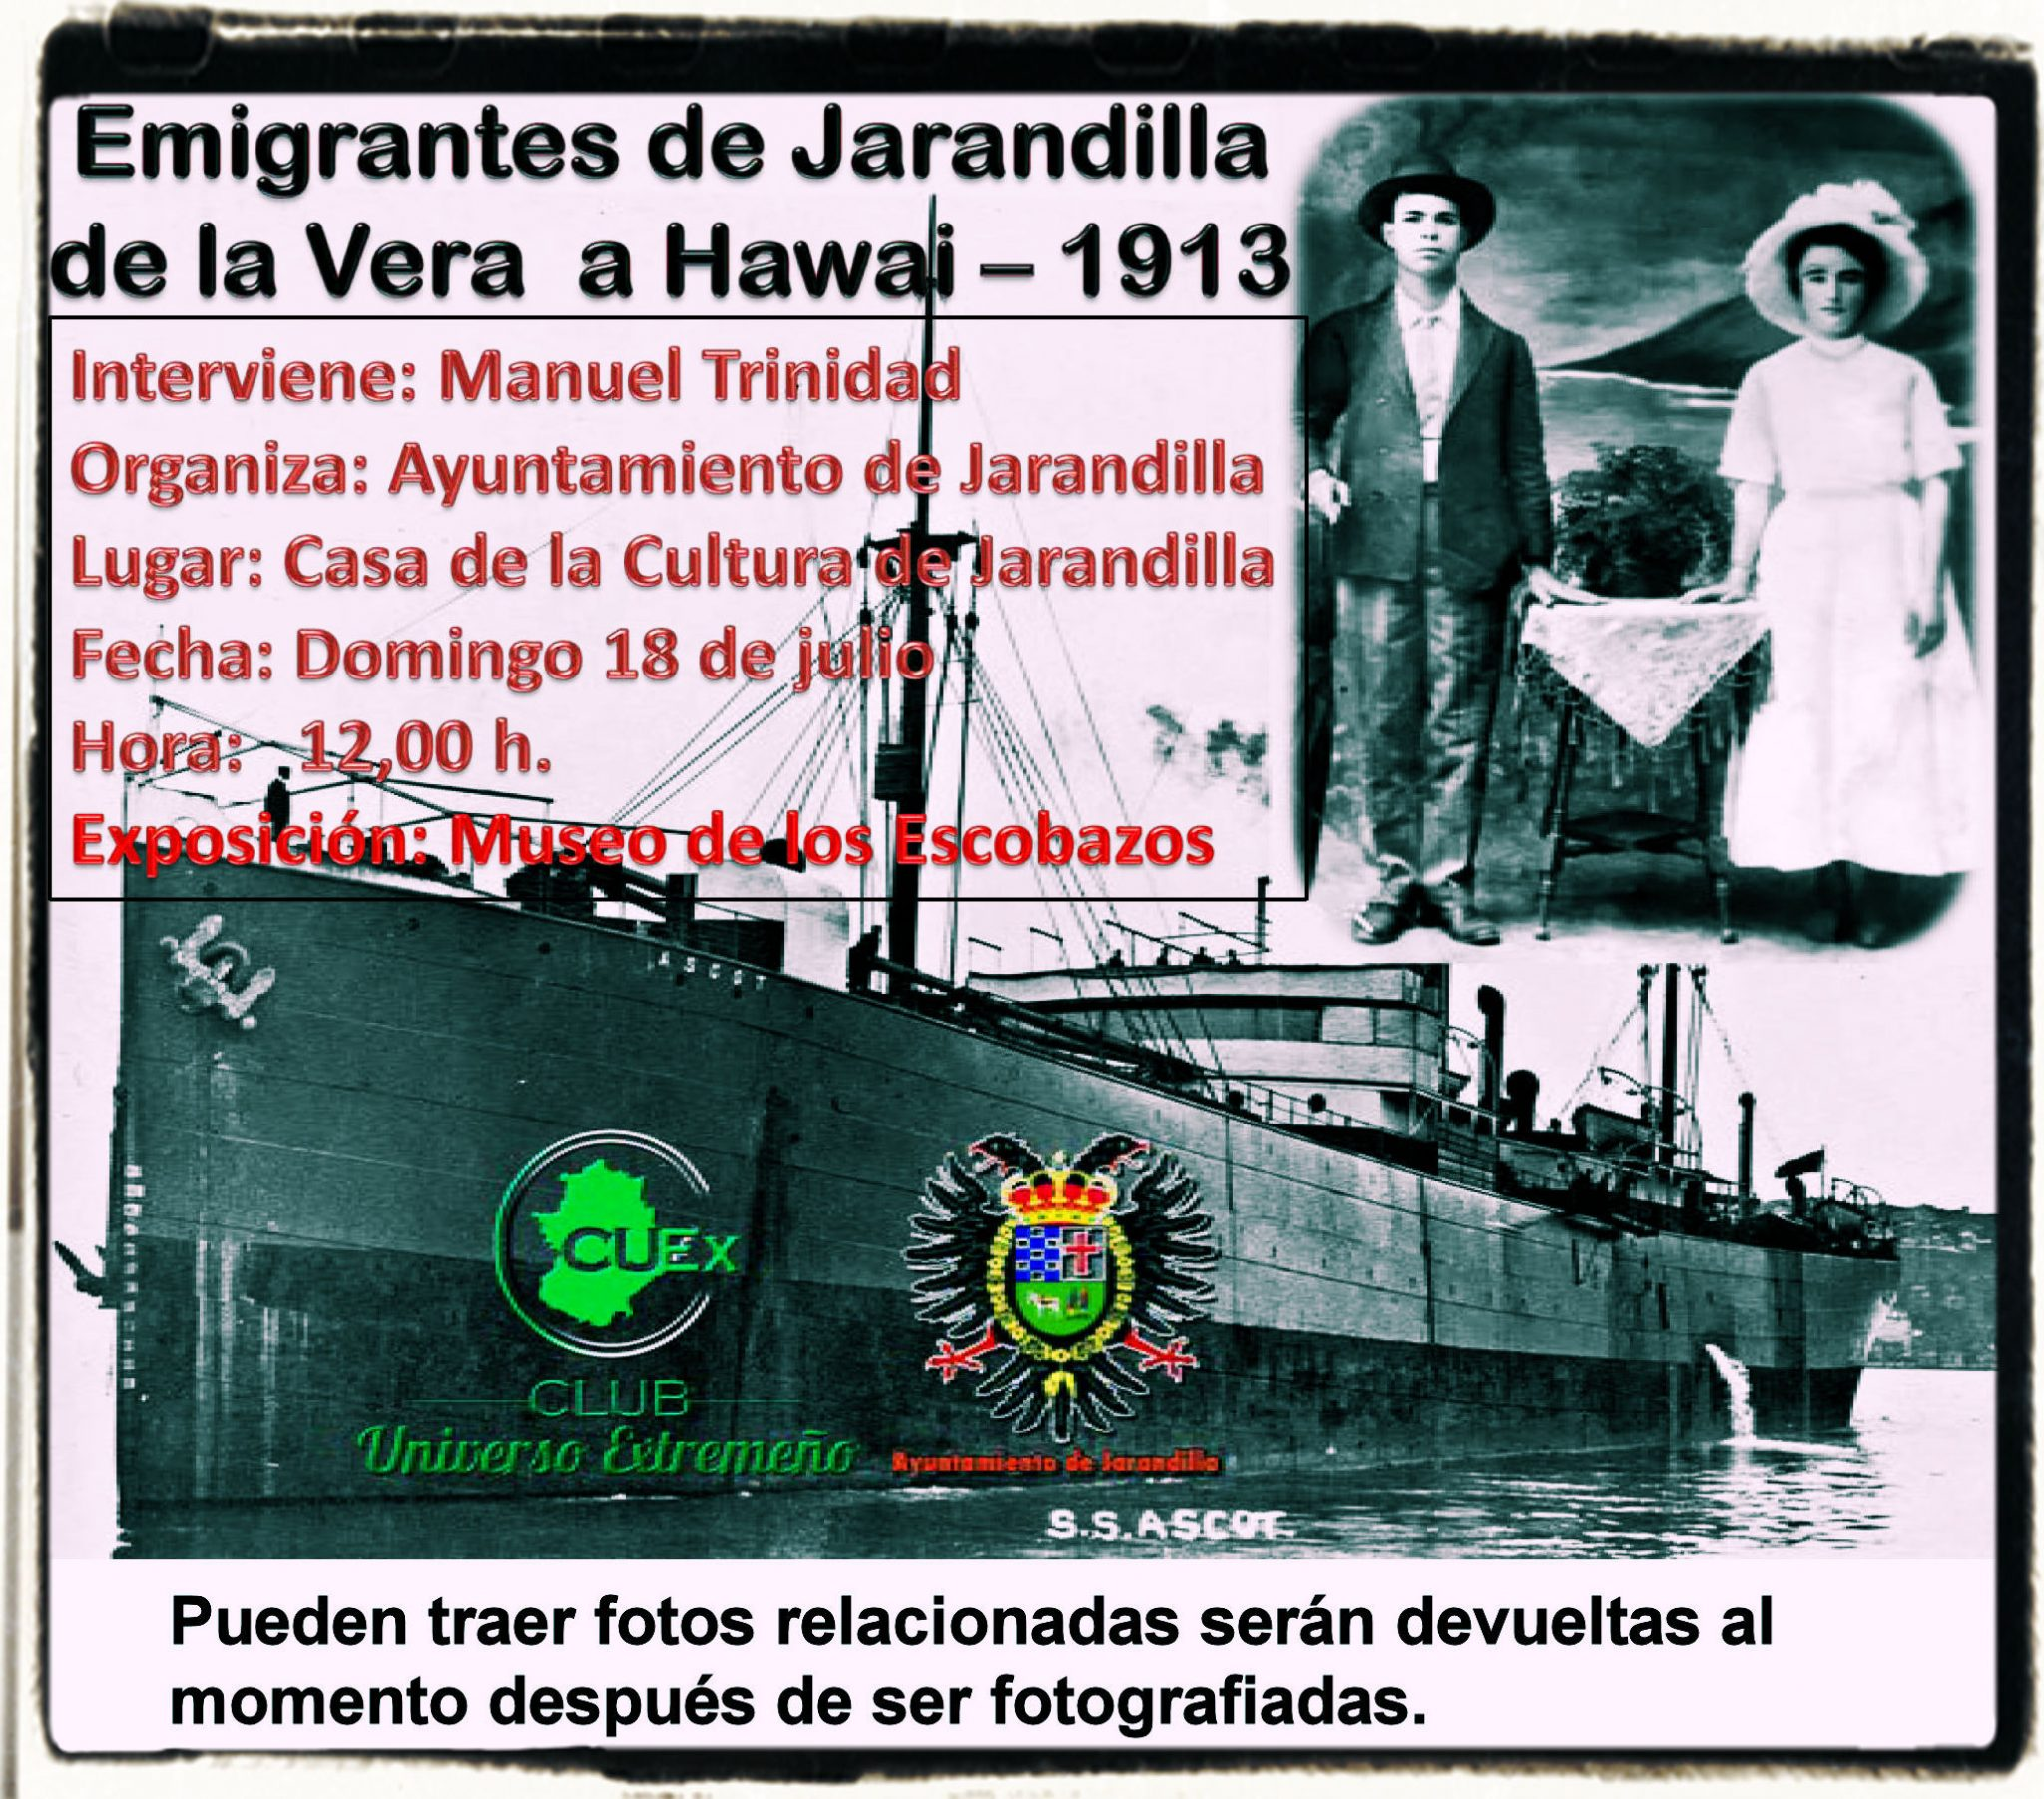 18/7/2021 Charla sobre los emigrantes de Jarandilla de la Vera a Hawai (1913)